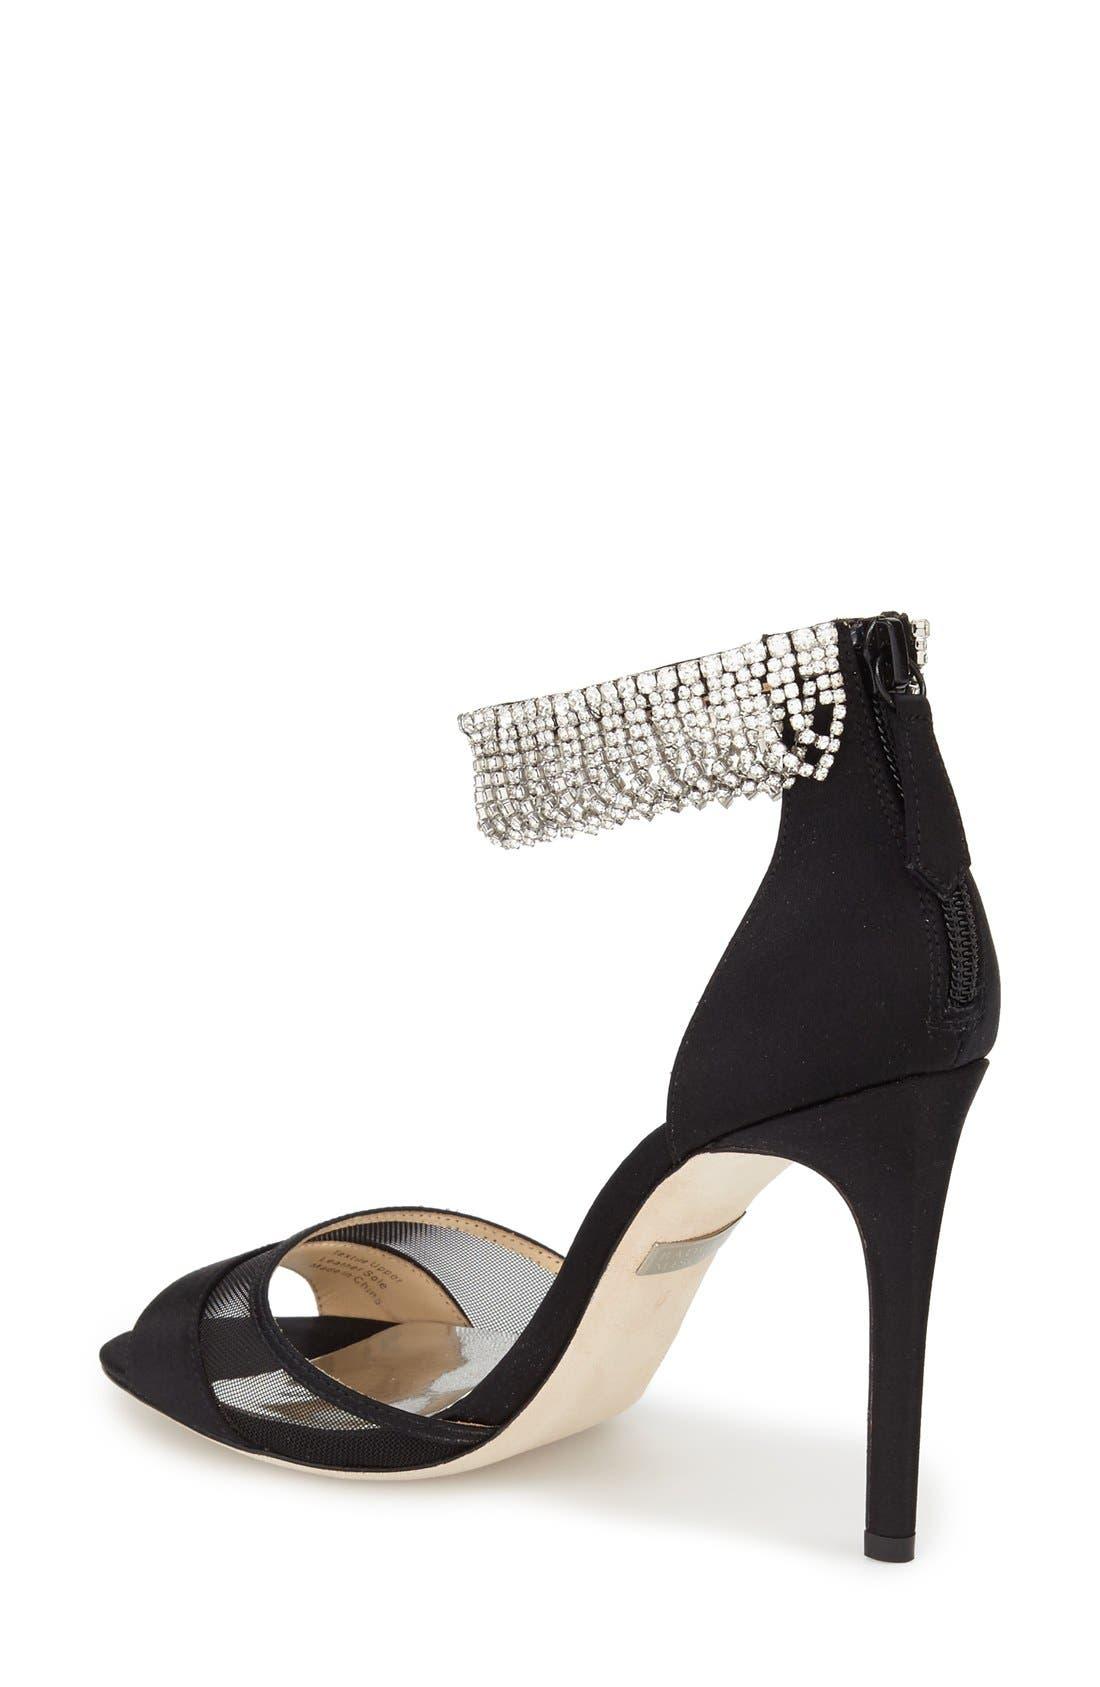 Alternate Image 2  - Badgley Mischka 'Gazelle' Ankle Strap Sandal (Women)